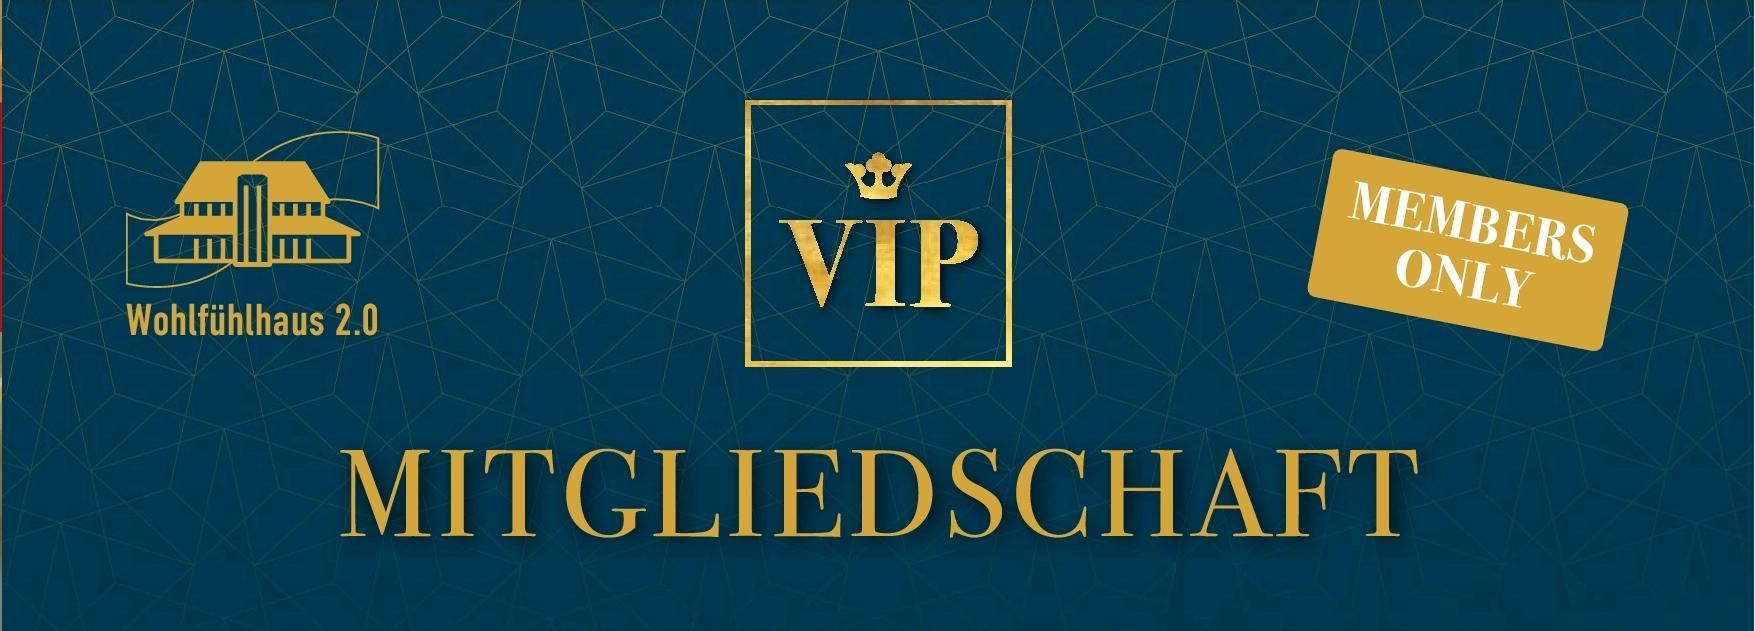 VIP Mitgliedschaft cut